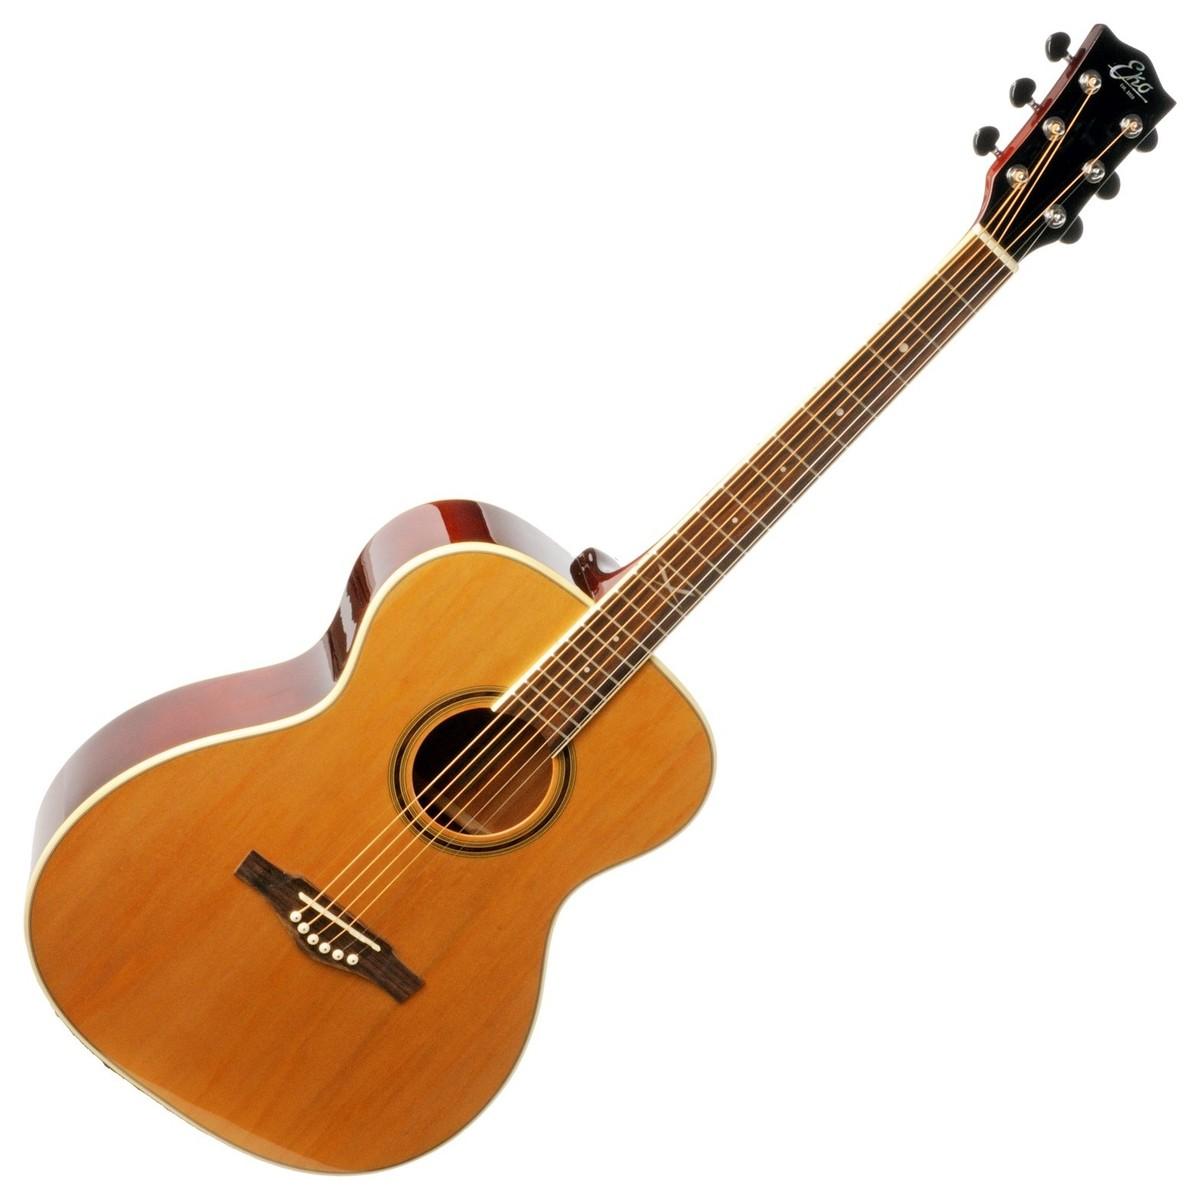 guitare acoustique eko